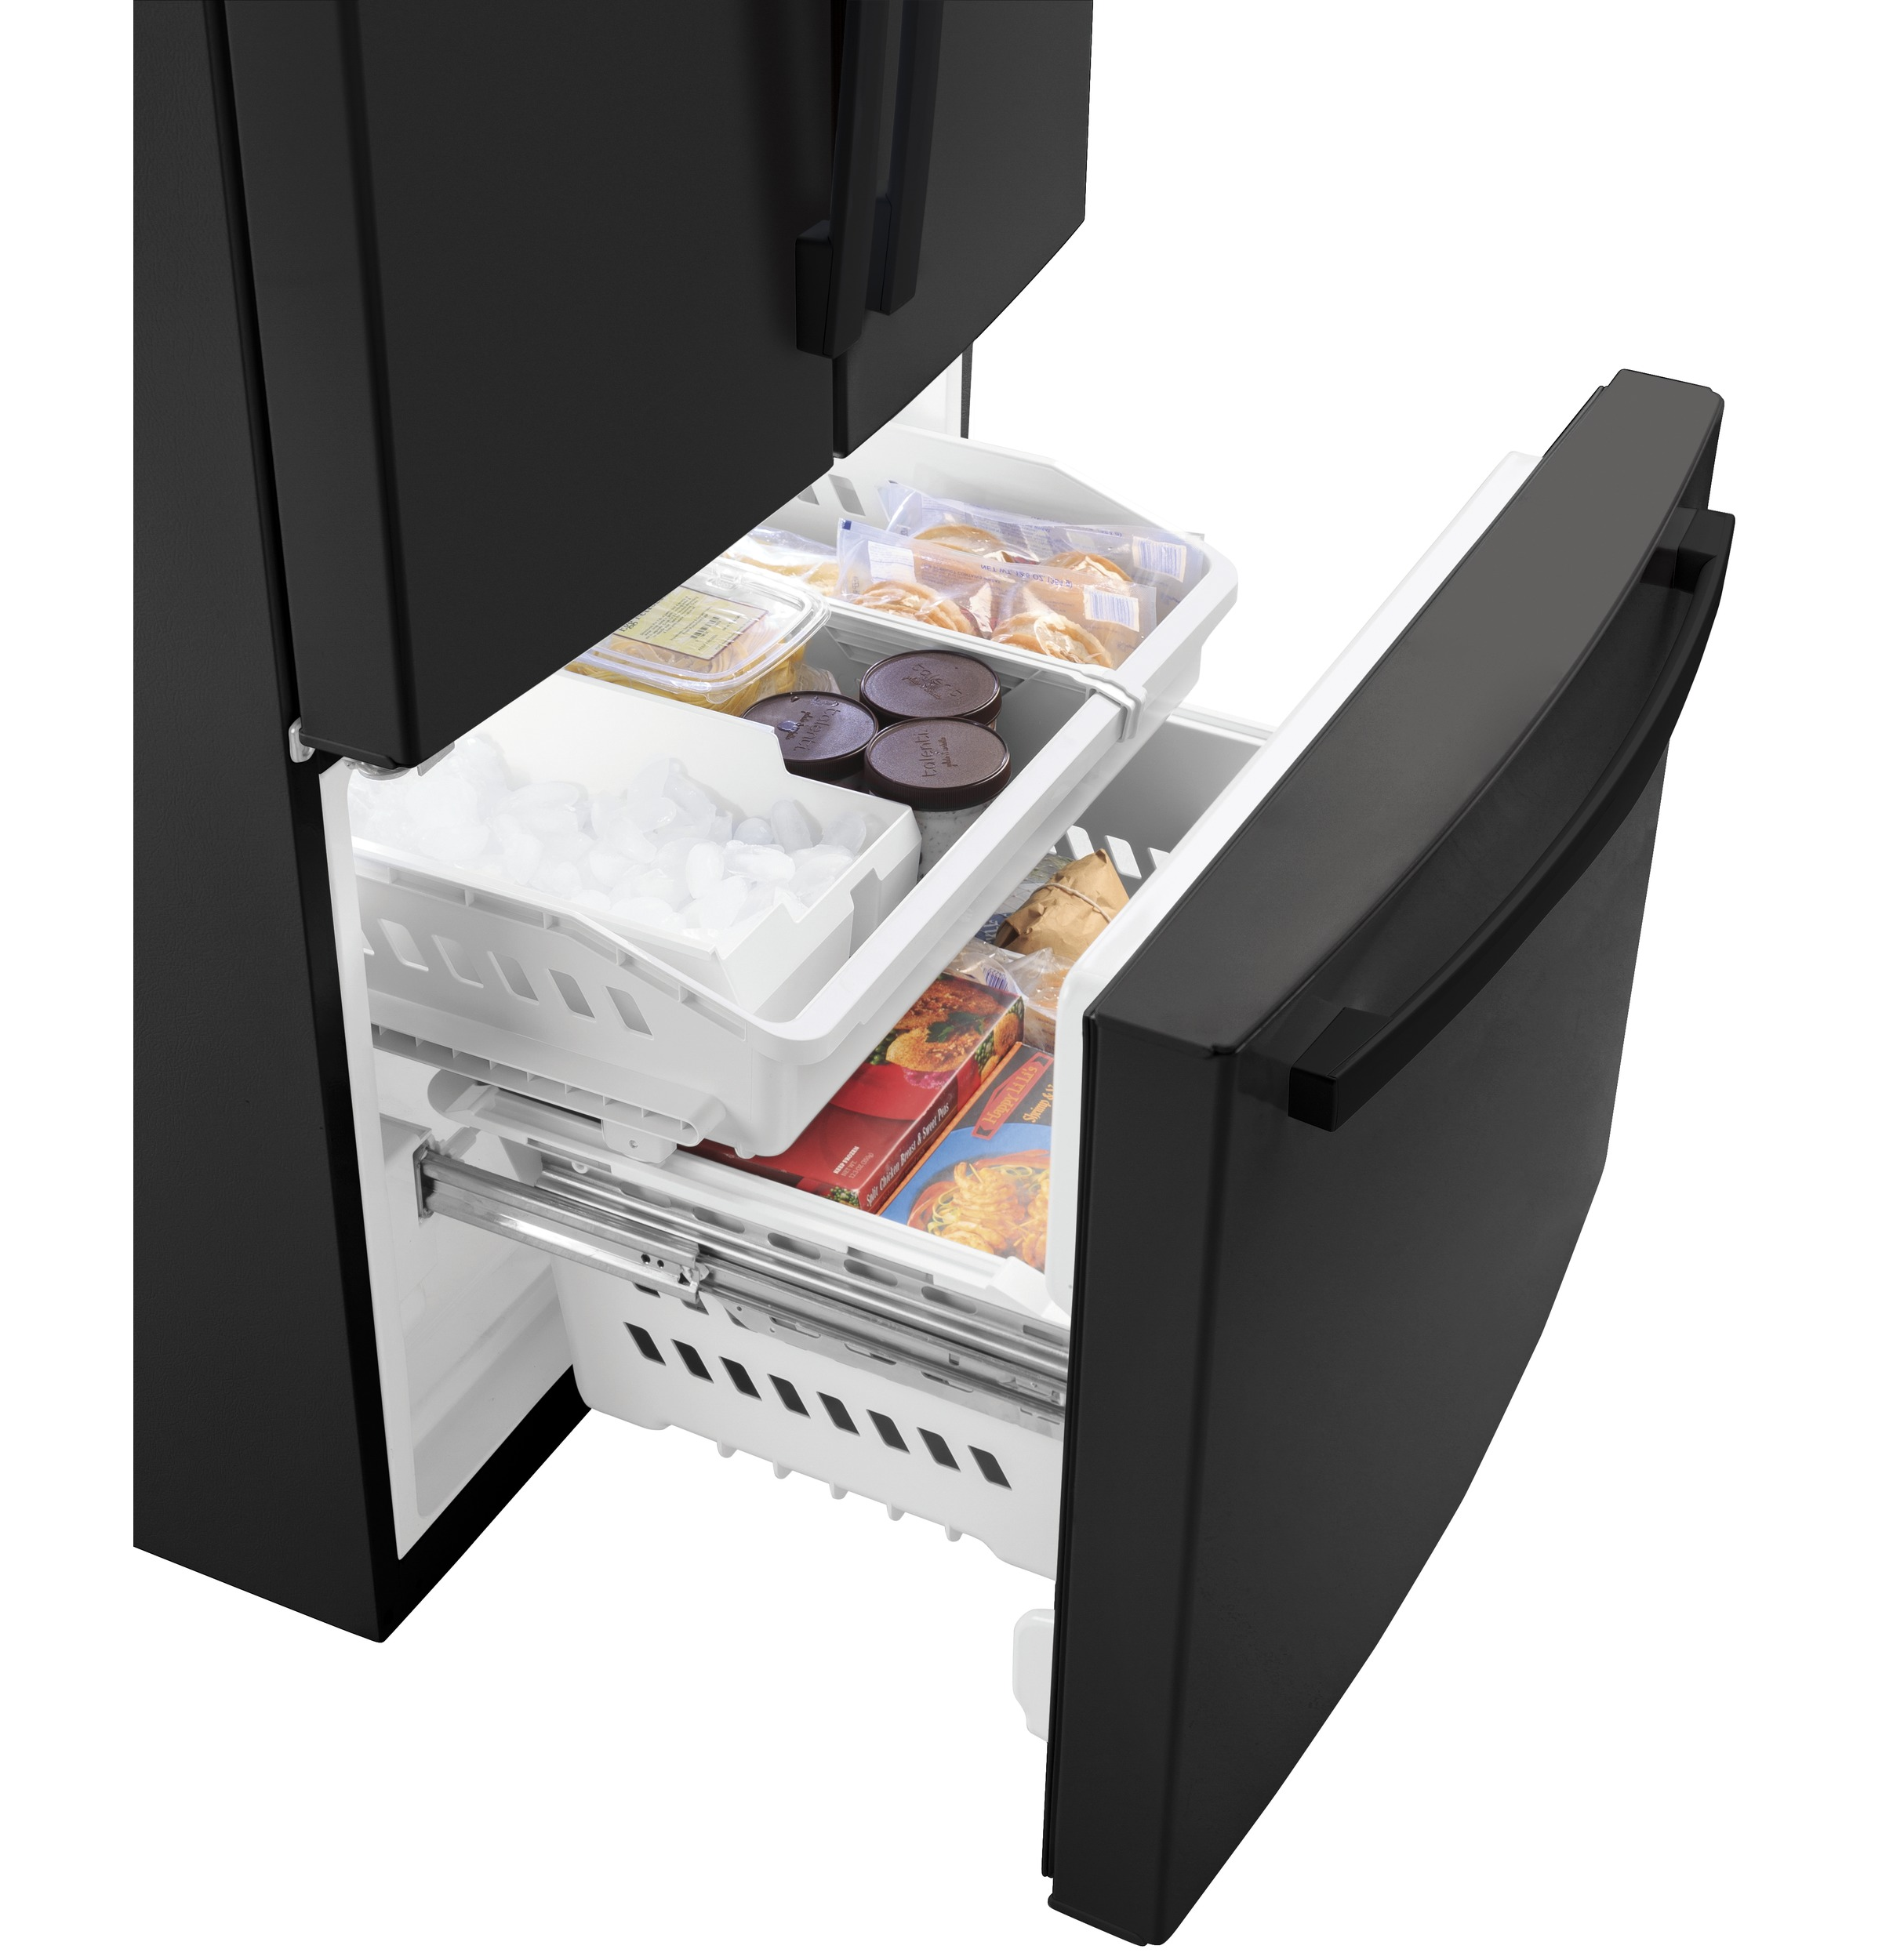 Model: GWE19JGLBB   GE GE® ENERGY STAR® 18.6 Cu. Ft. Counter-Depth French-Door Refrigerator